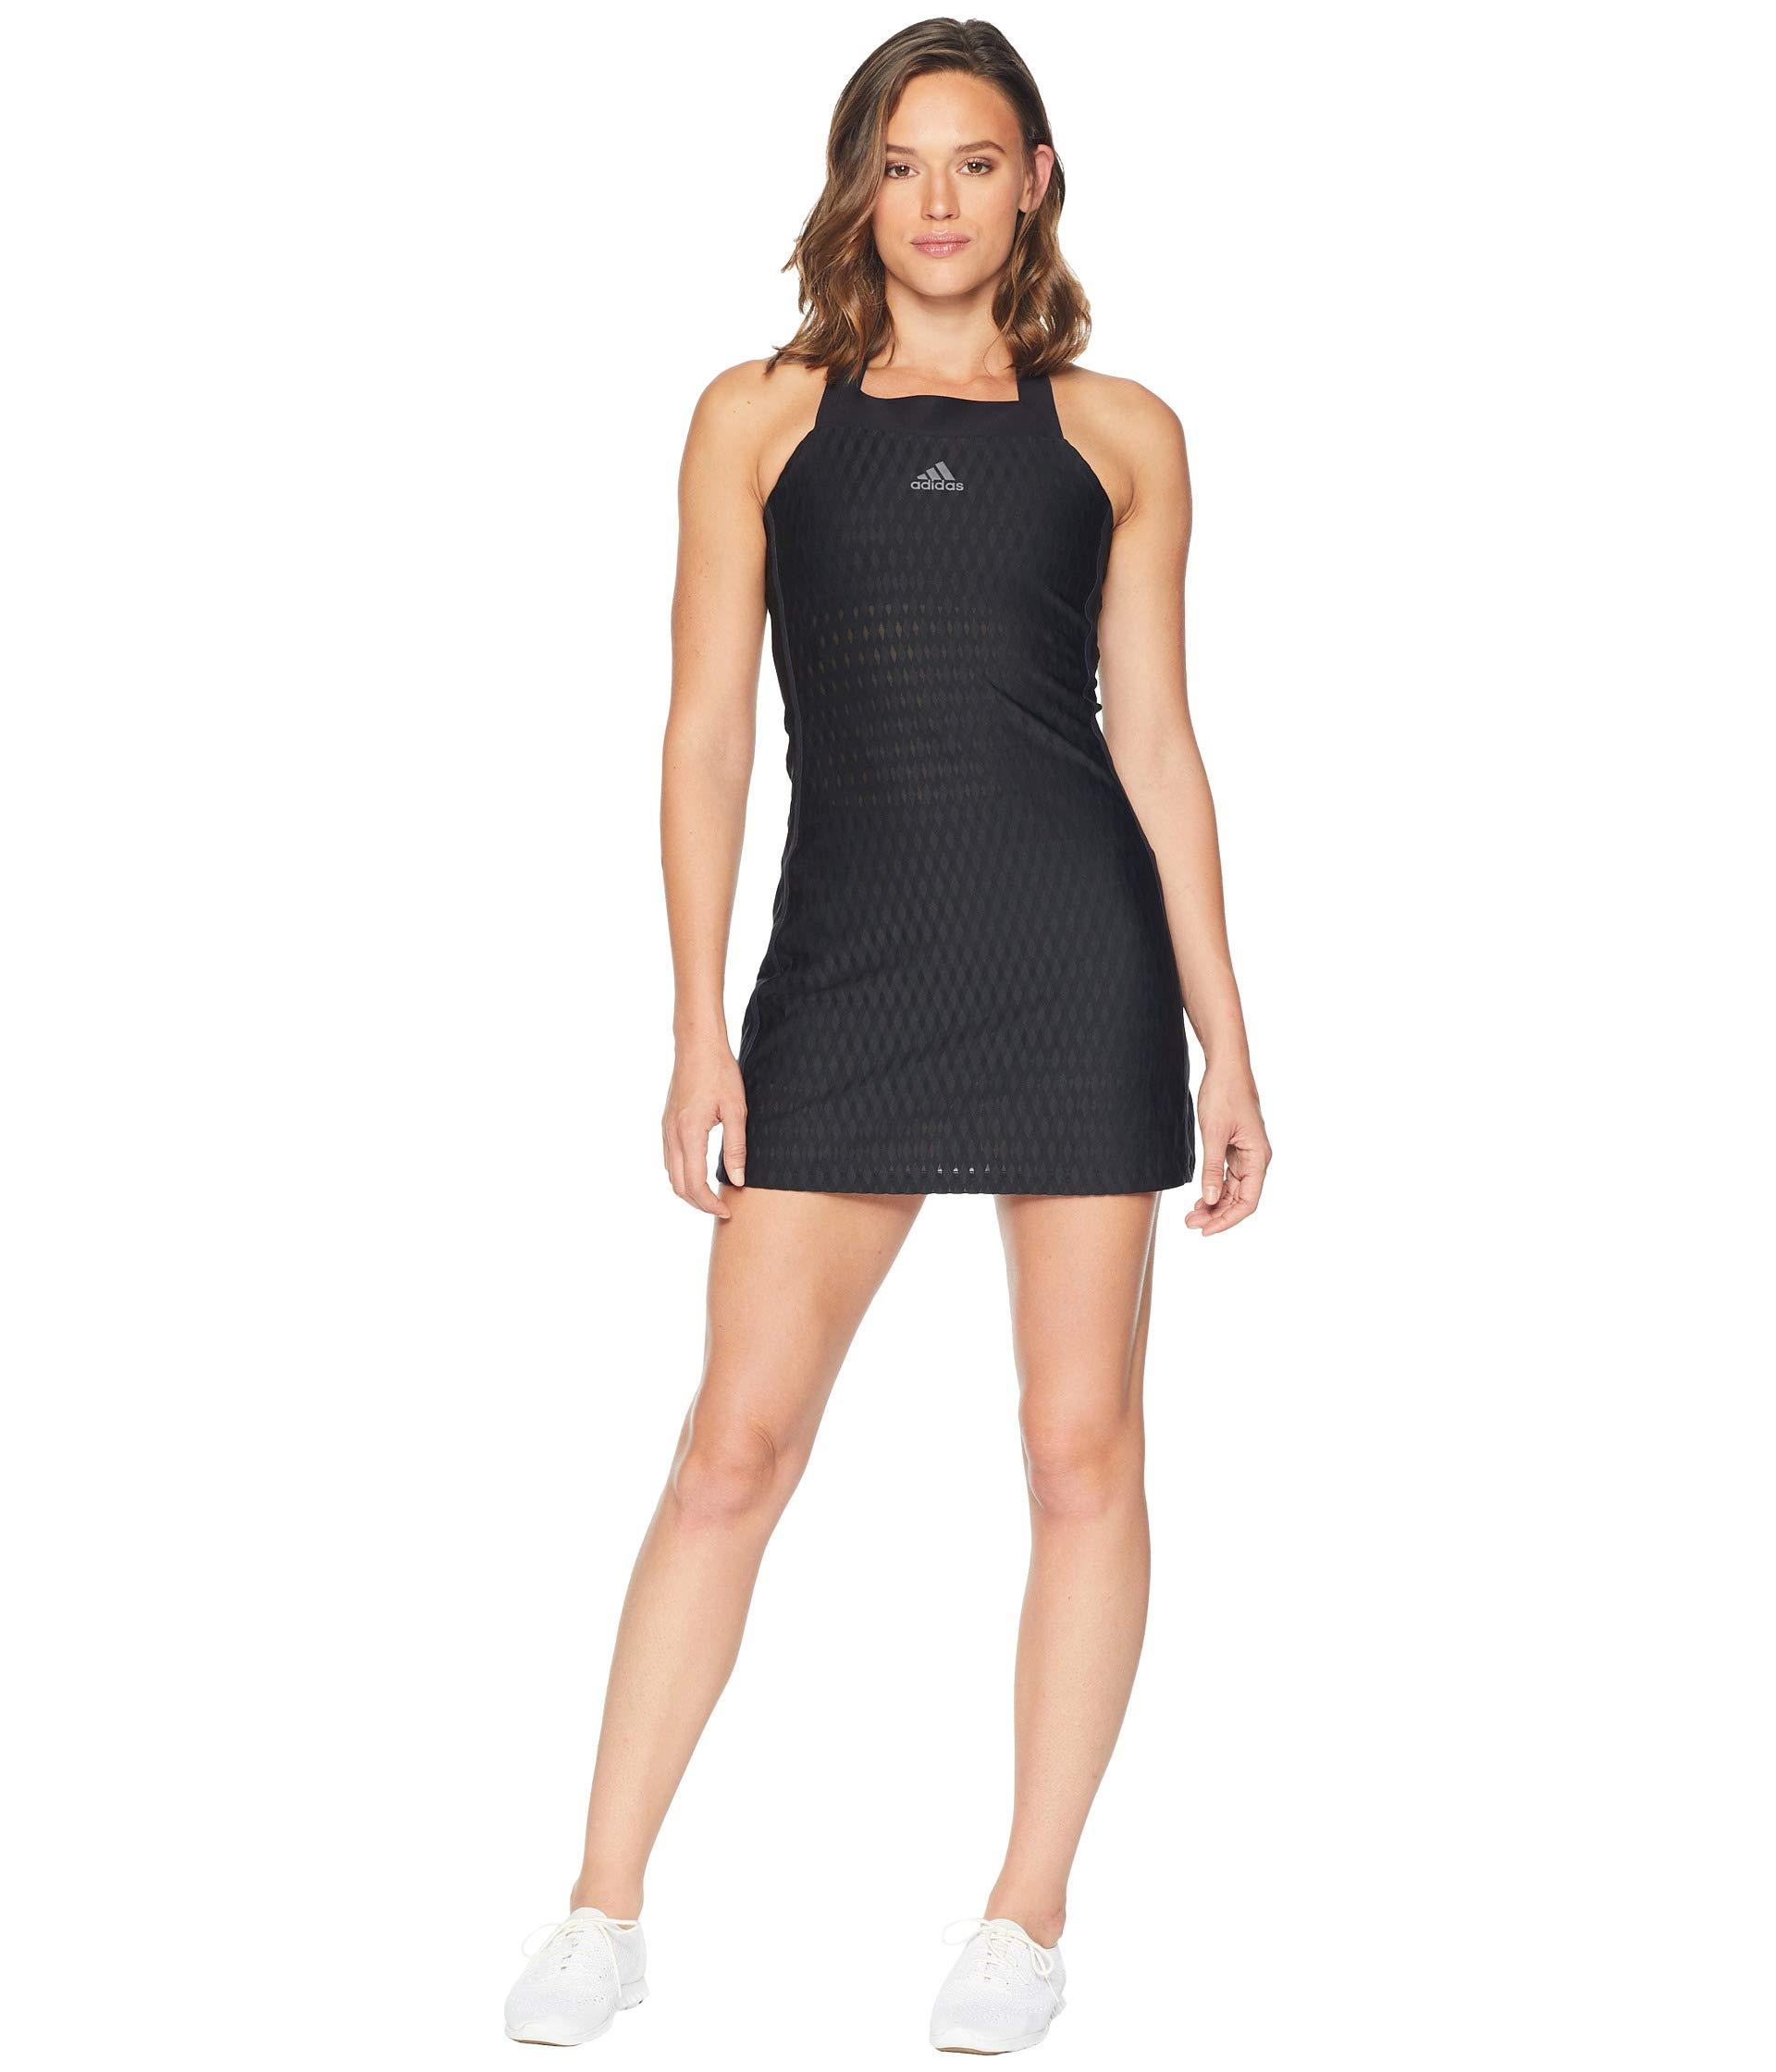 adidas Tennis Barricade Dress, Black, Large